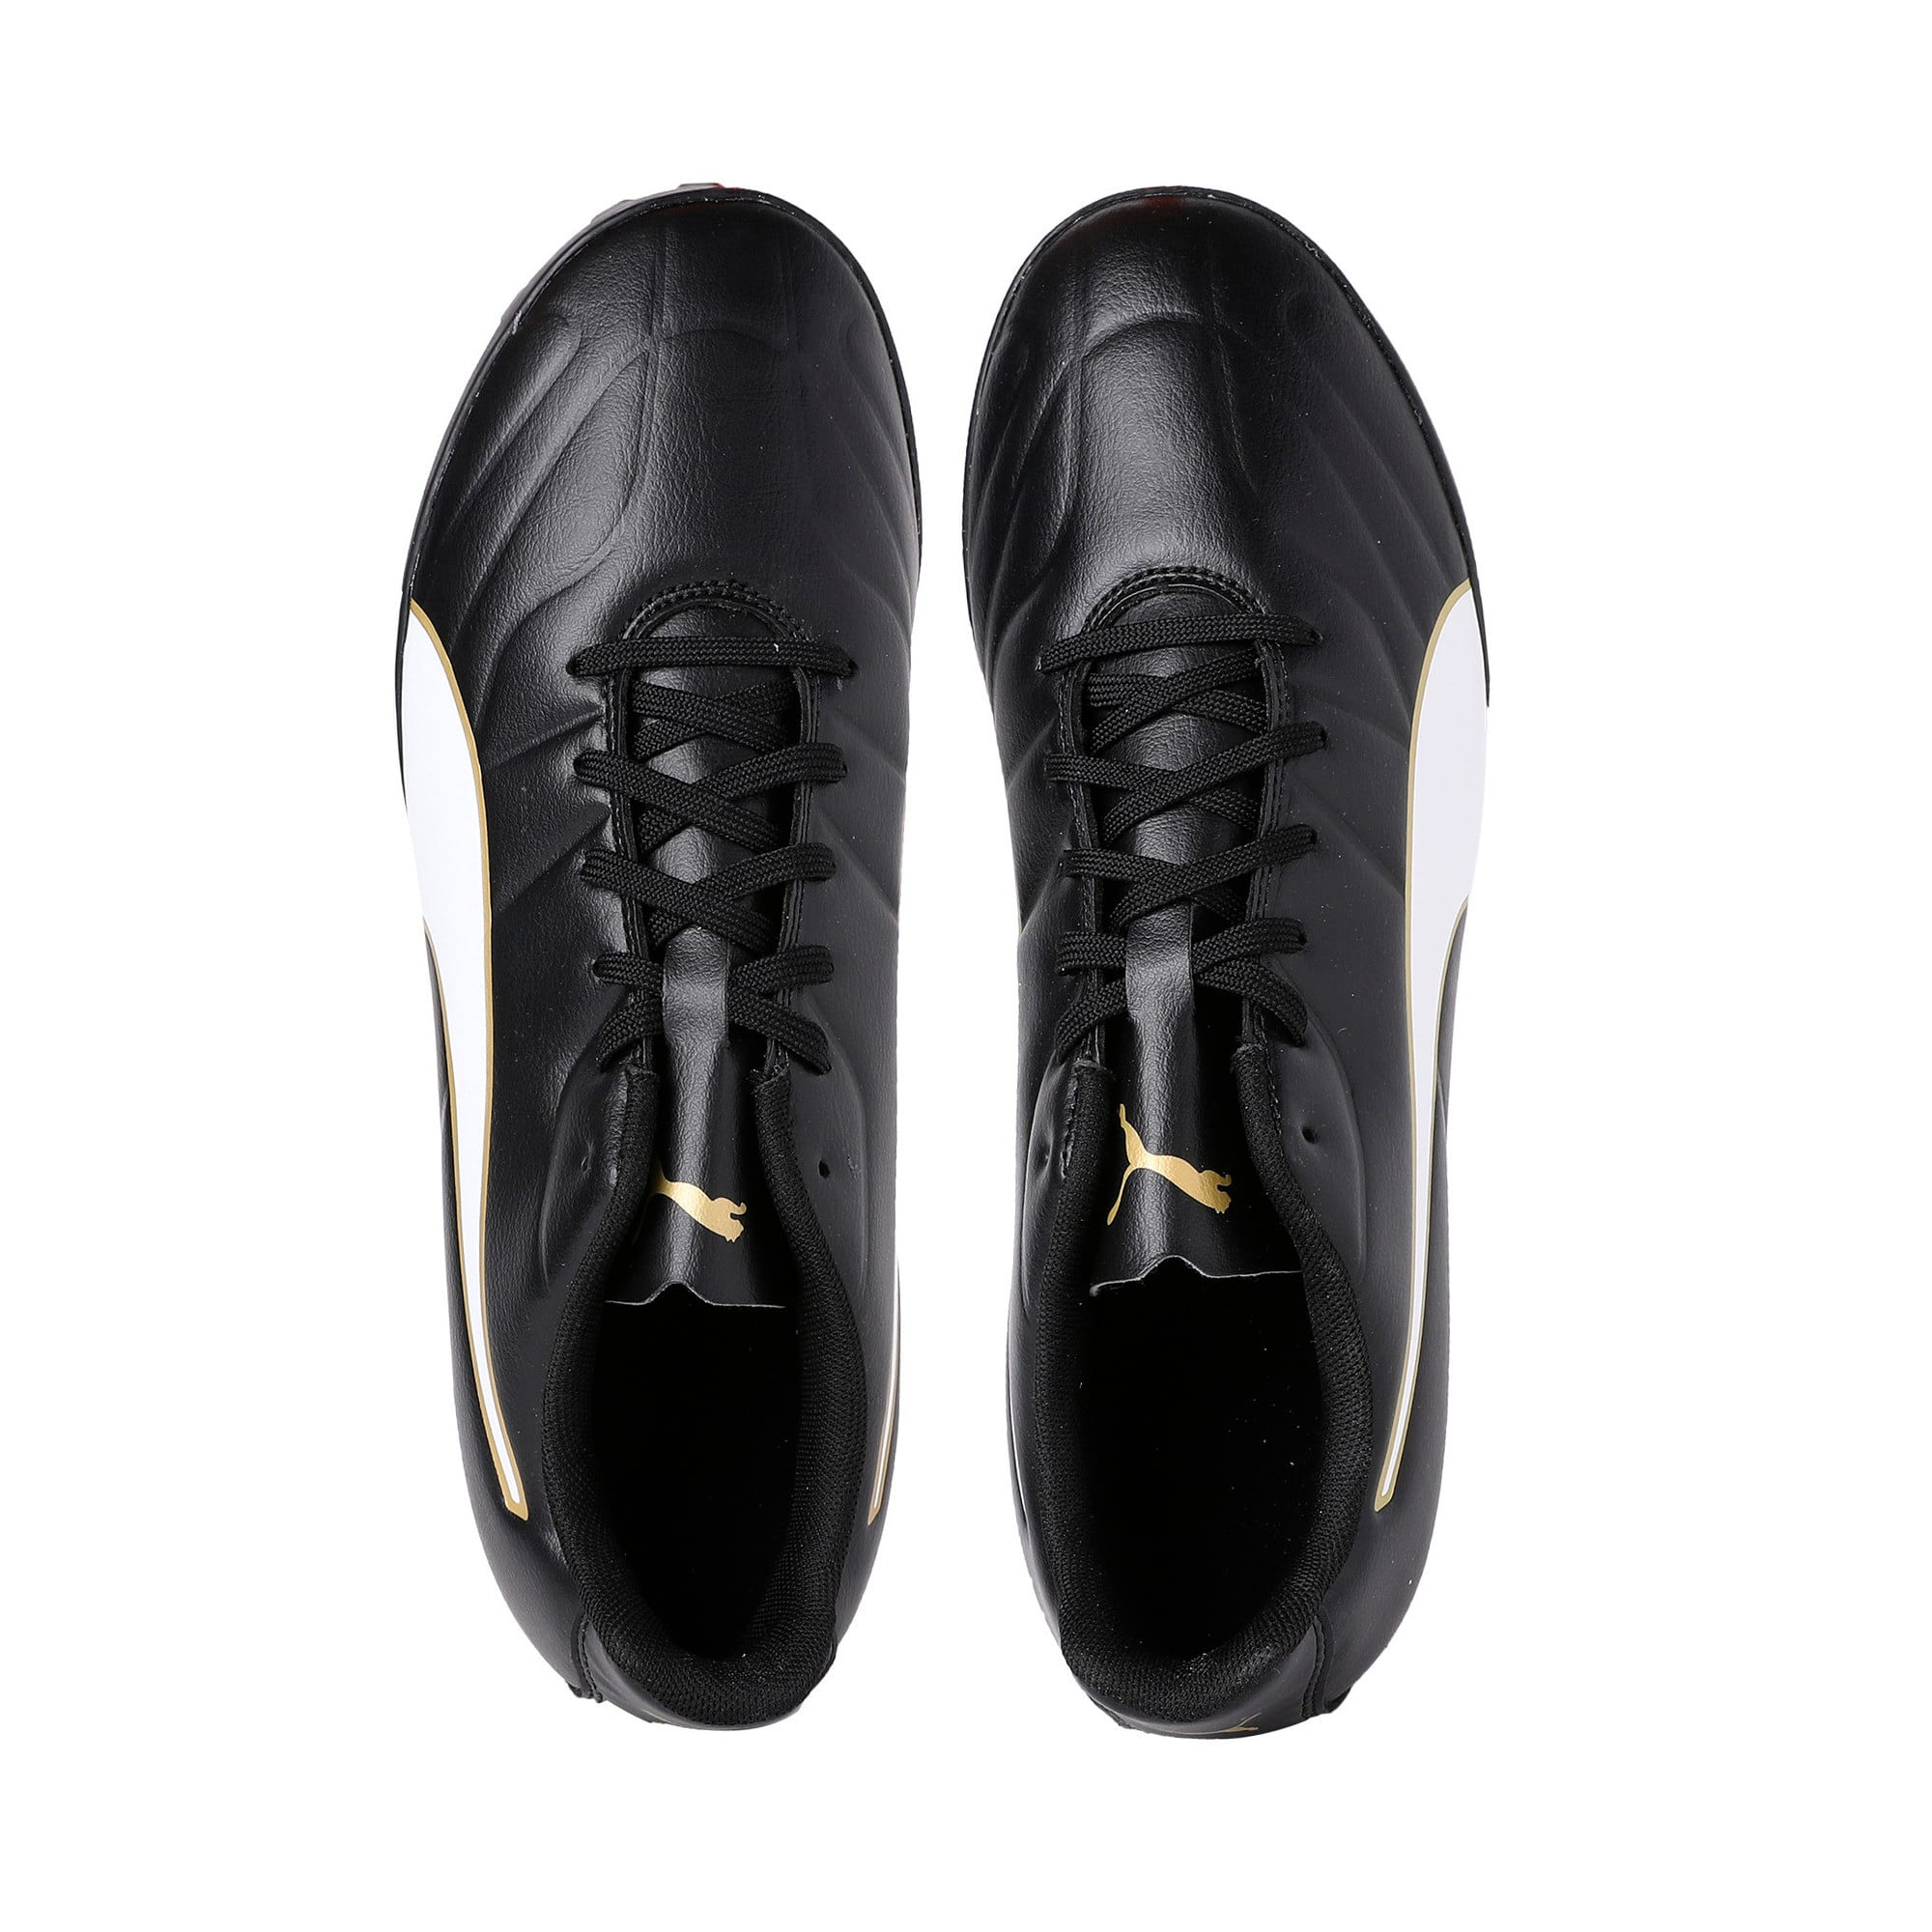 Thumbnail 6 of Classico C II Men's Football Boots, Black-White-Gold, medium-IND